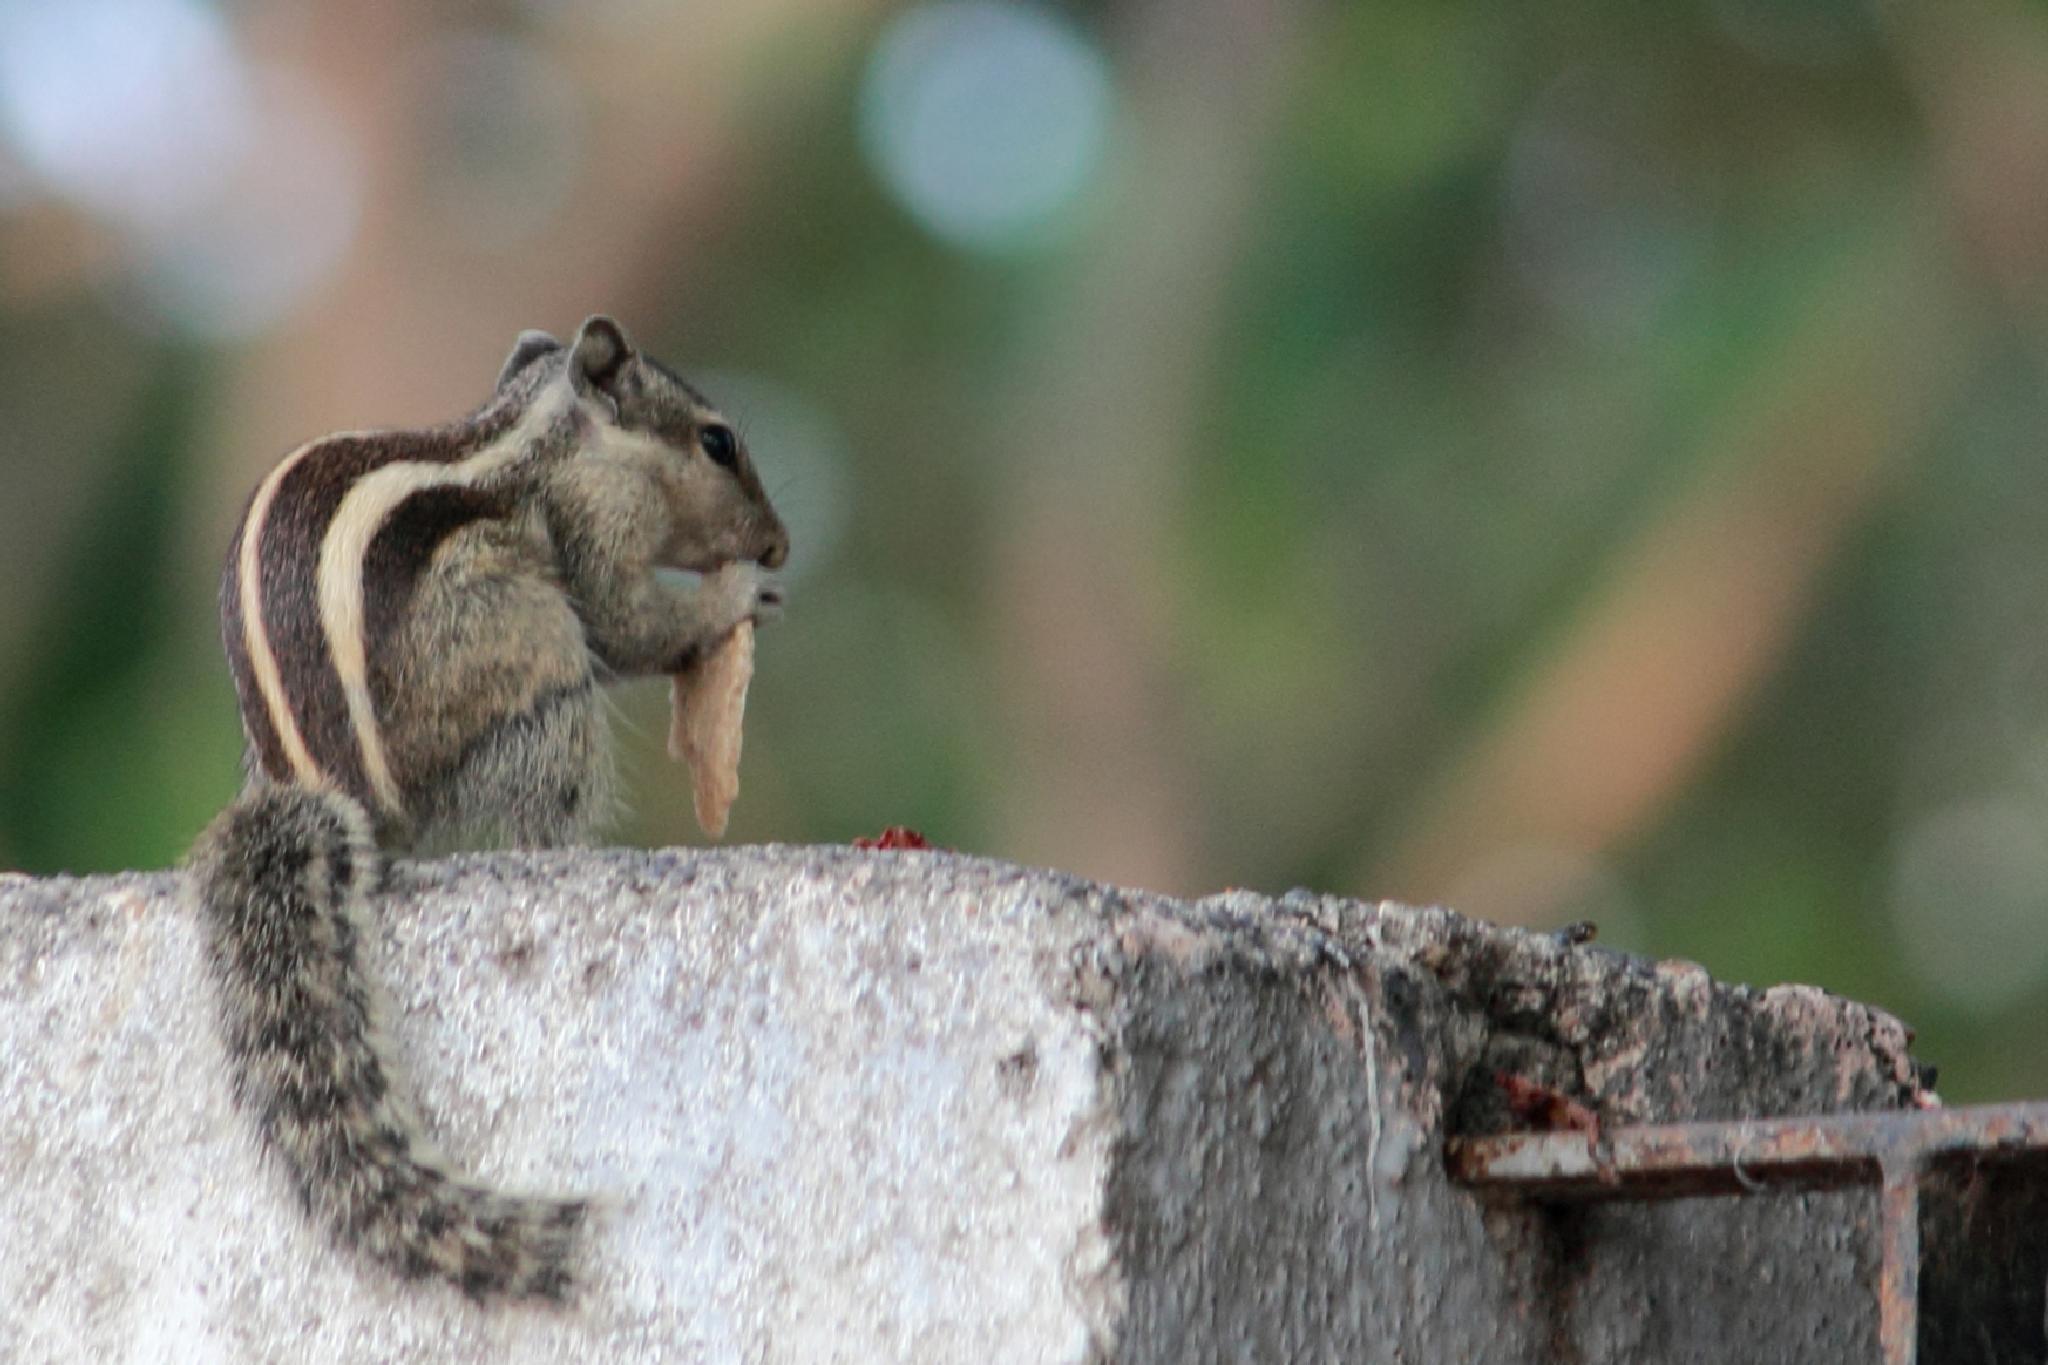 Squirrel  - surat by dipakmarfatia